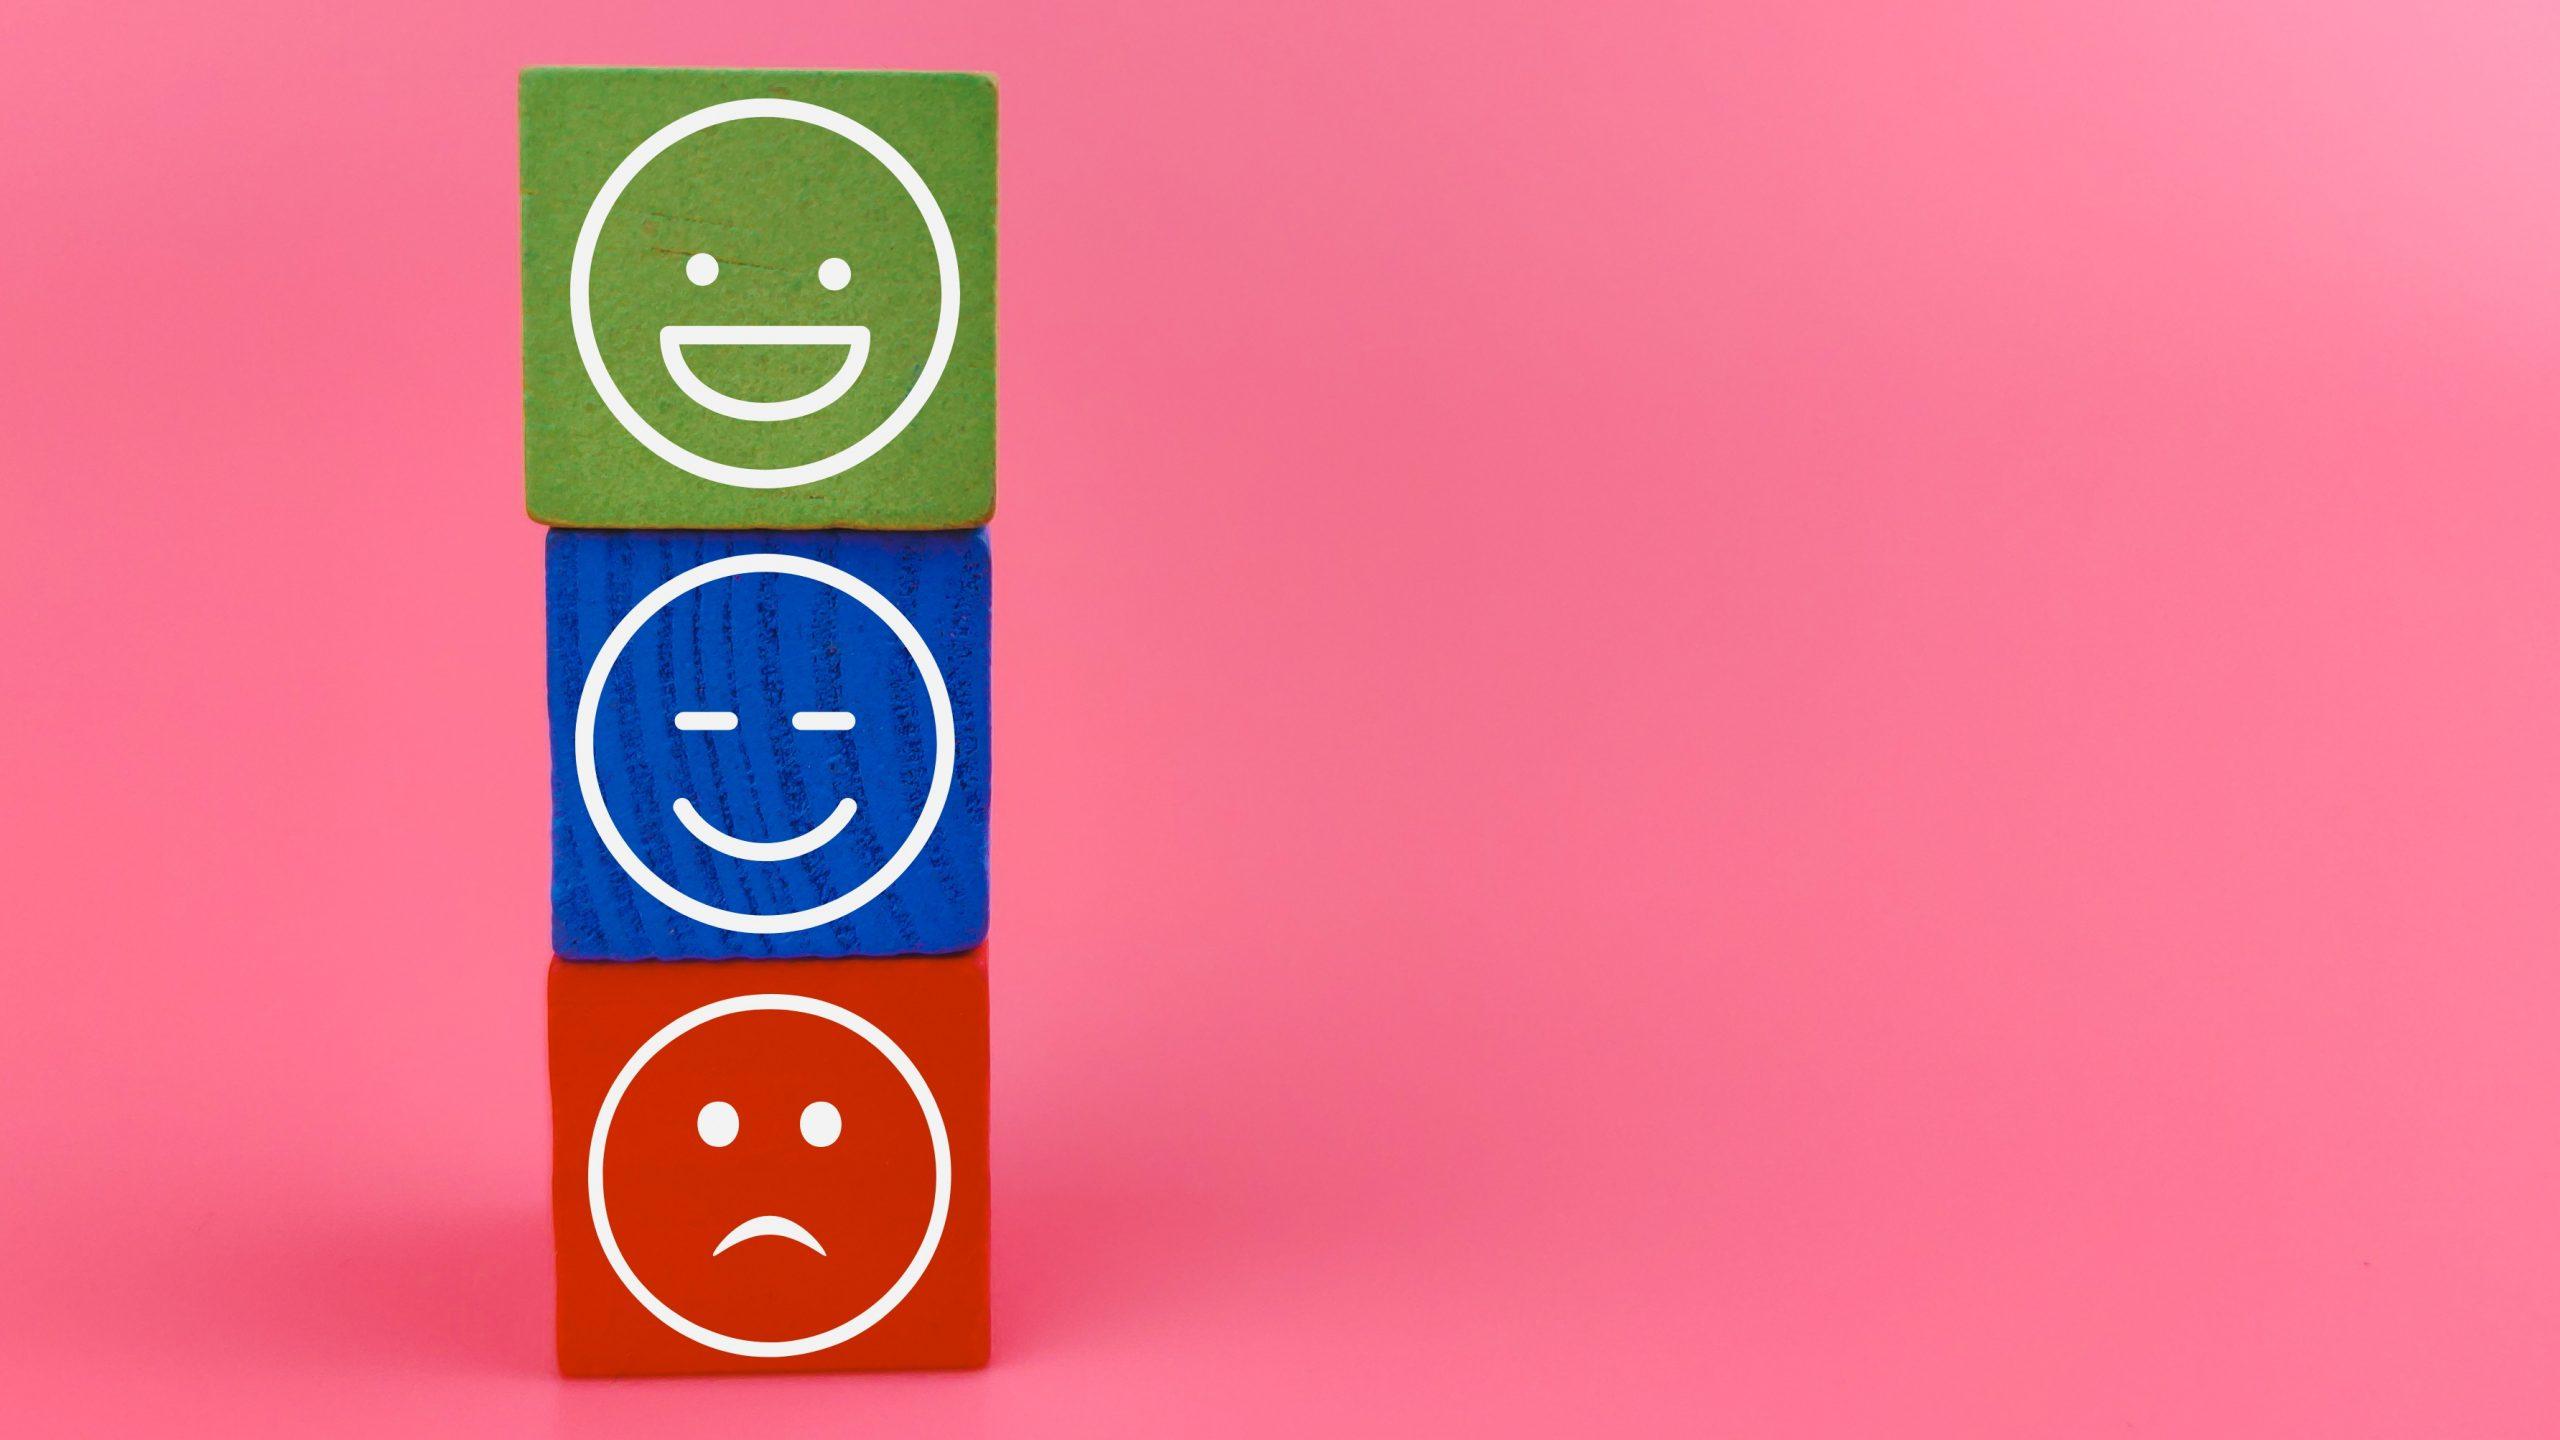 Feedback emoticons for mailserver monitoring